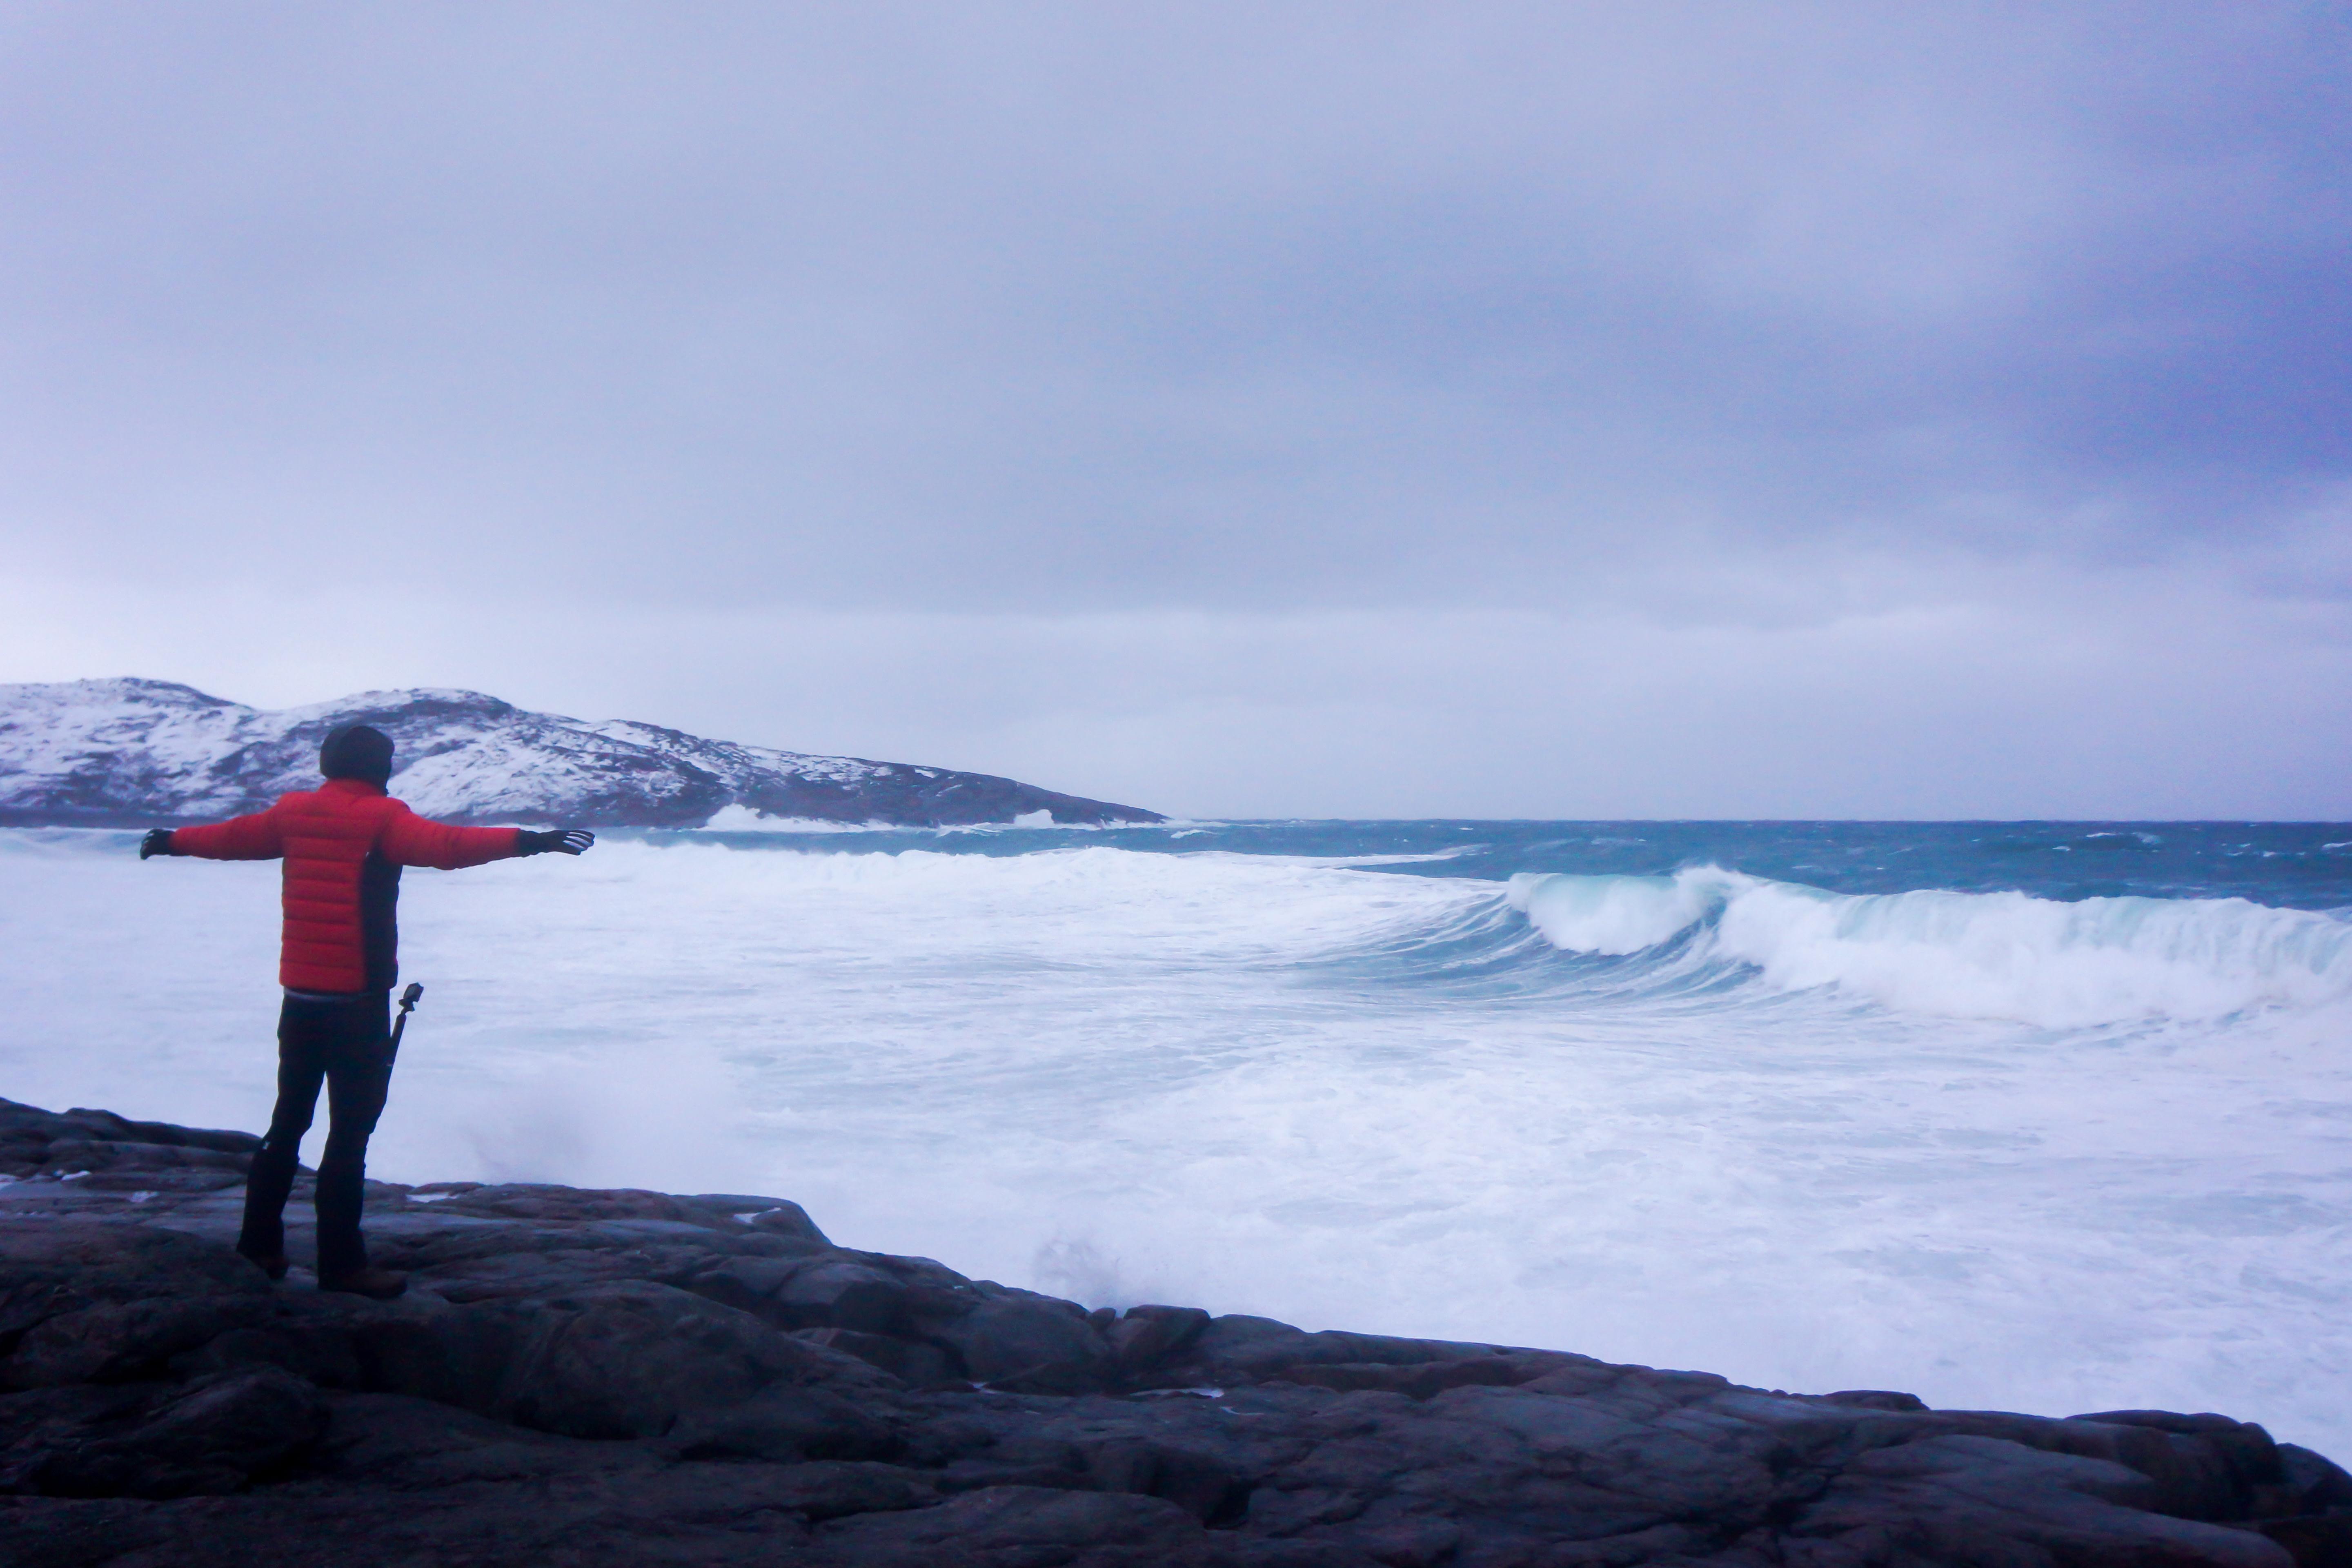 Arctic Ocean Tour from Murmansk